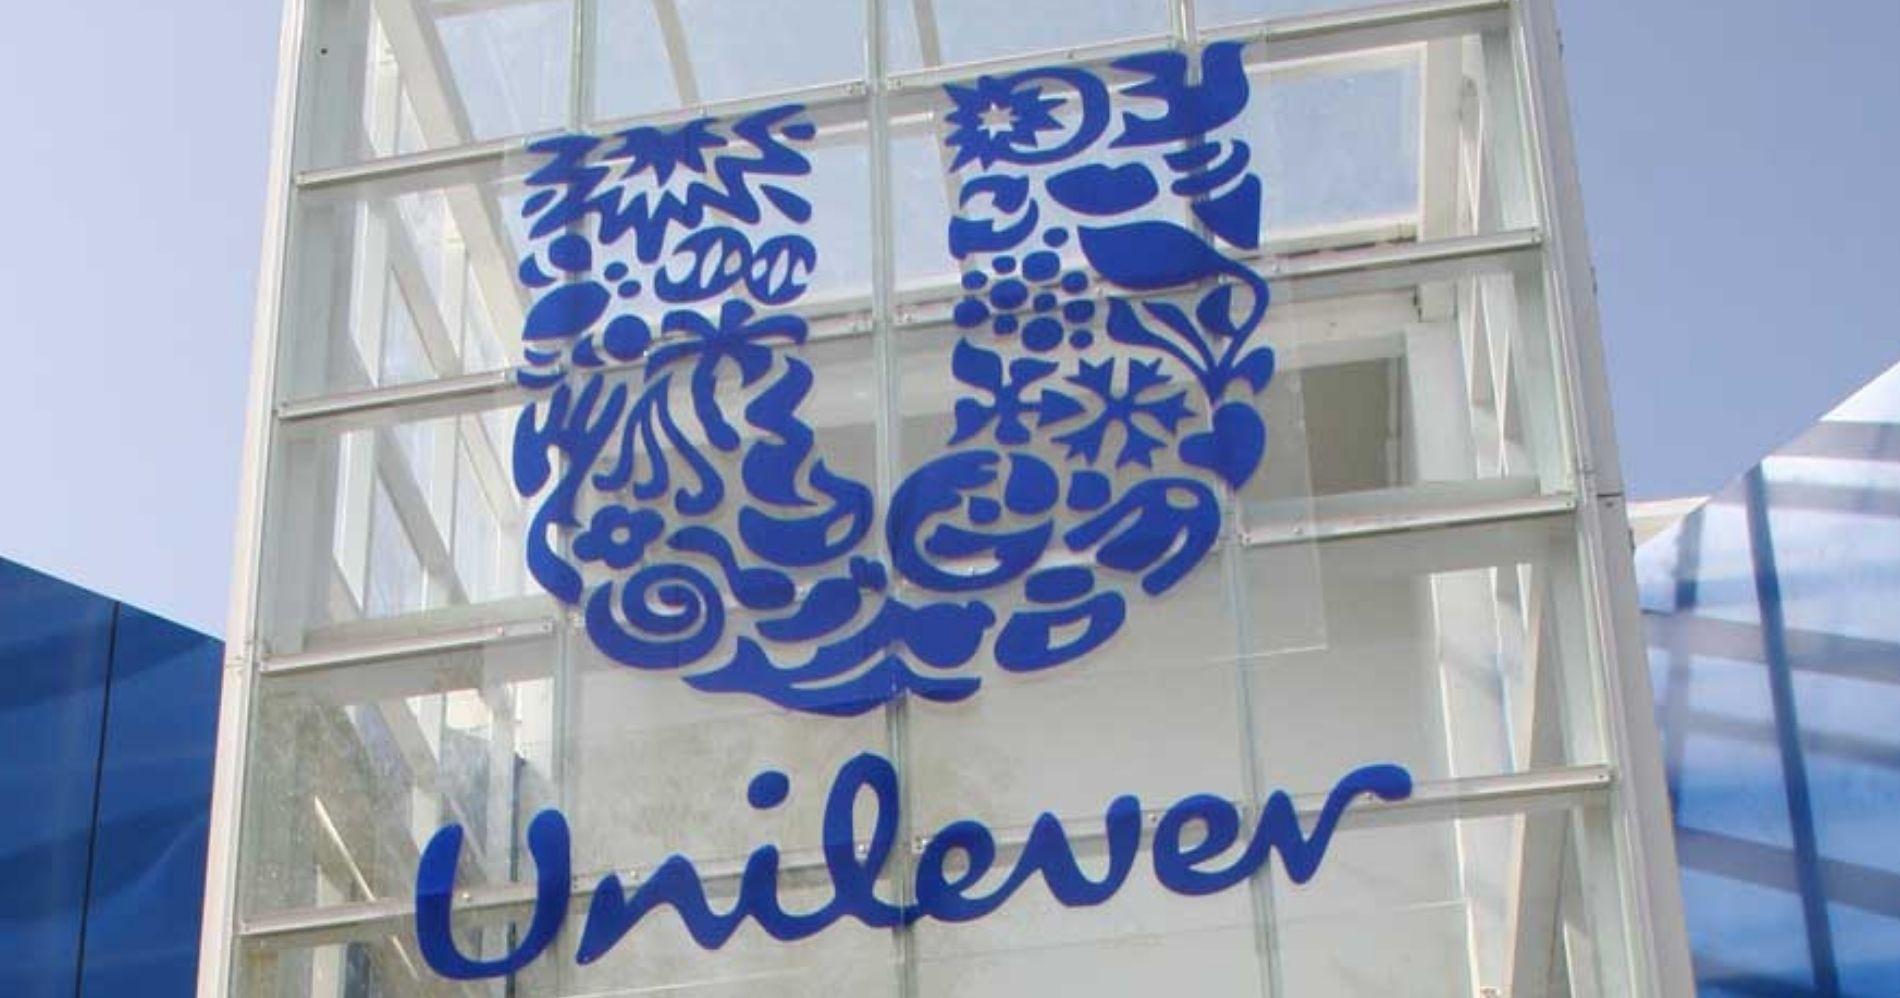 Unilever Illustration Bisnis Muda - Image: Unilver